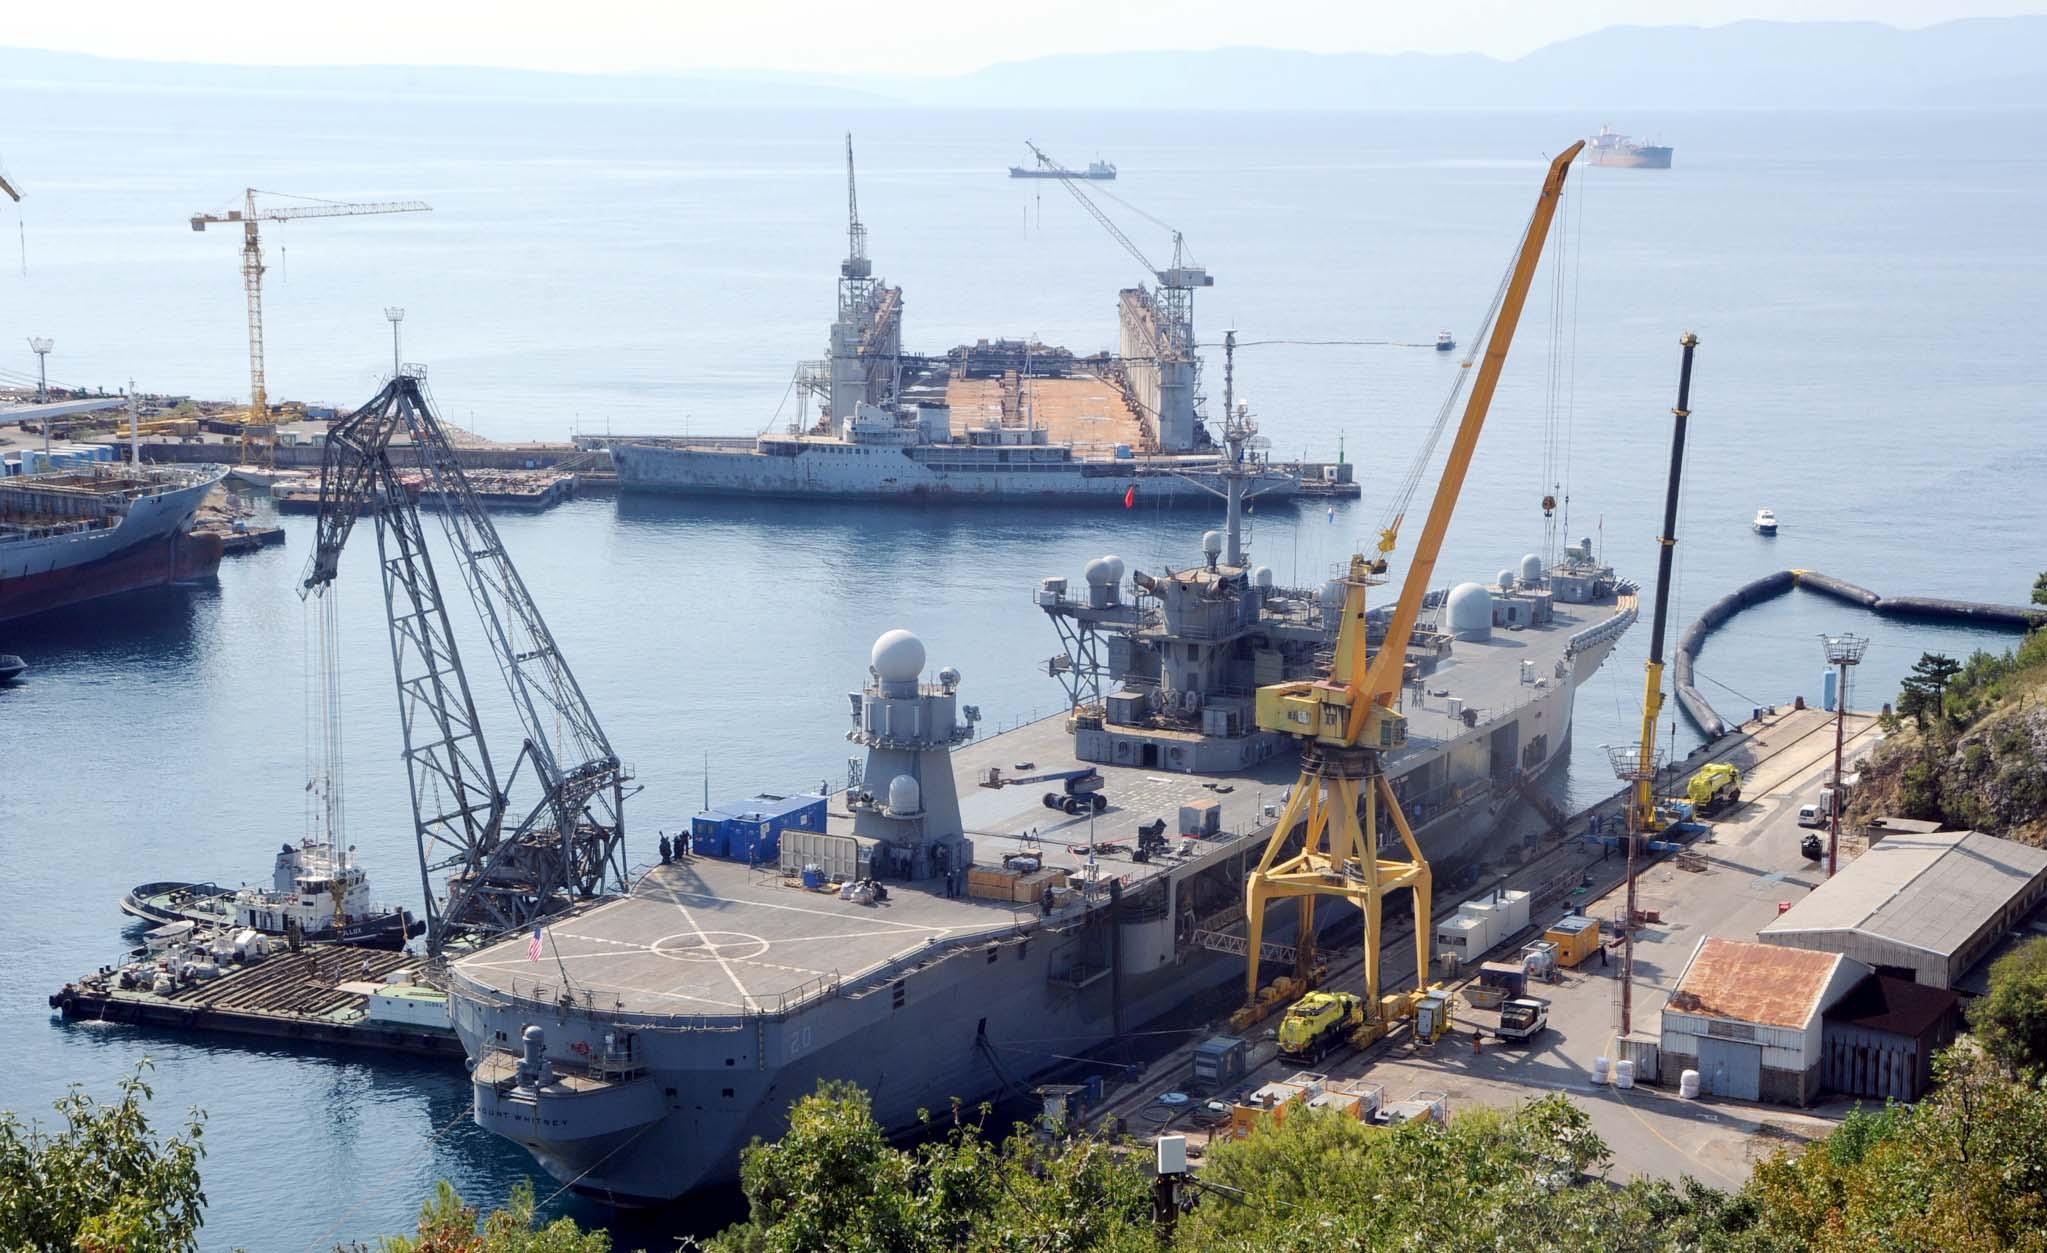 USS Mount Whitney na remontu u Viktor Lencu / Foto Vedran Karuza